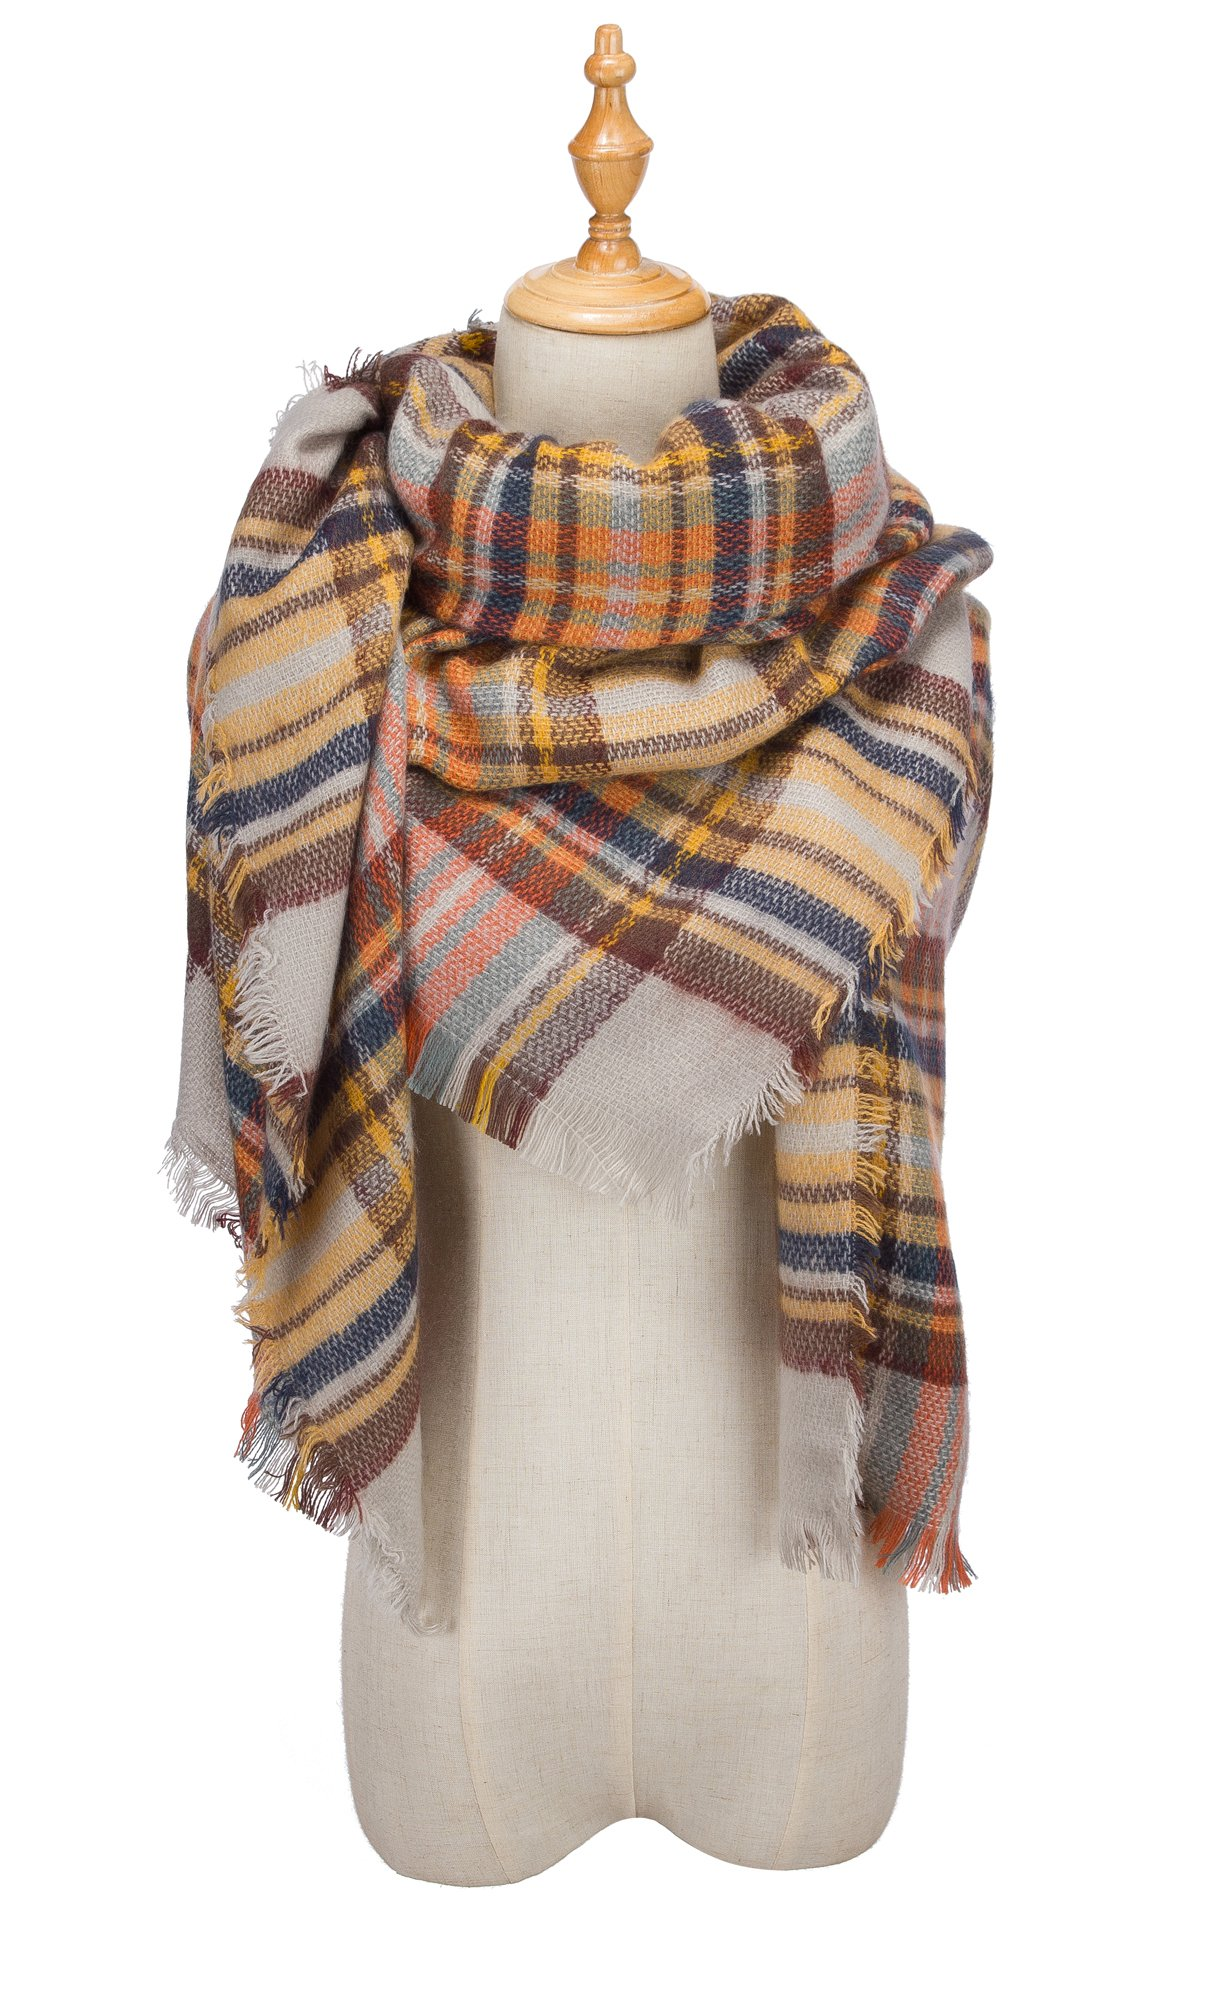 VIISHOW Fever Stylish Warm Blanket Scarf Gorgeous Wrap Shawl,L Beige,One Size